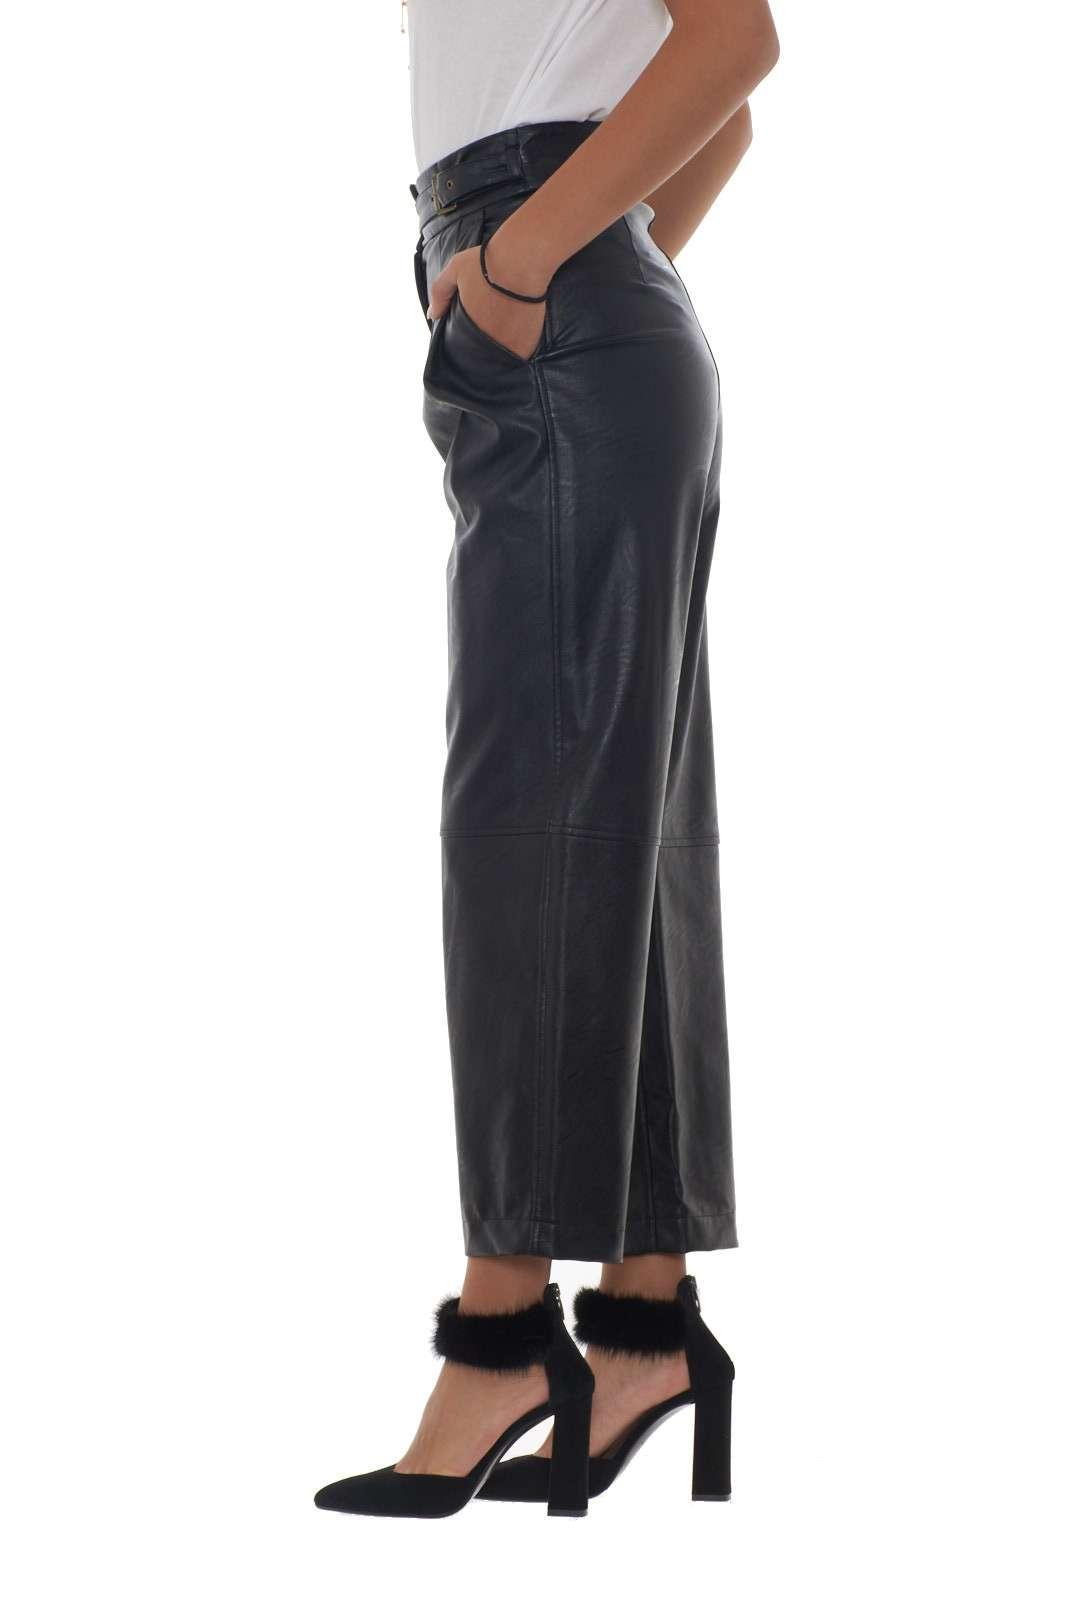 https://www.parmax.com/media/catalog/product/a/i/AI-outlet_parmax-pantaloni-donna-Twin-Set-192TT203C-B.jpg